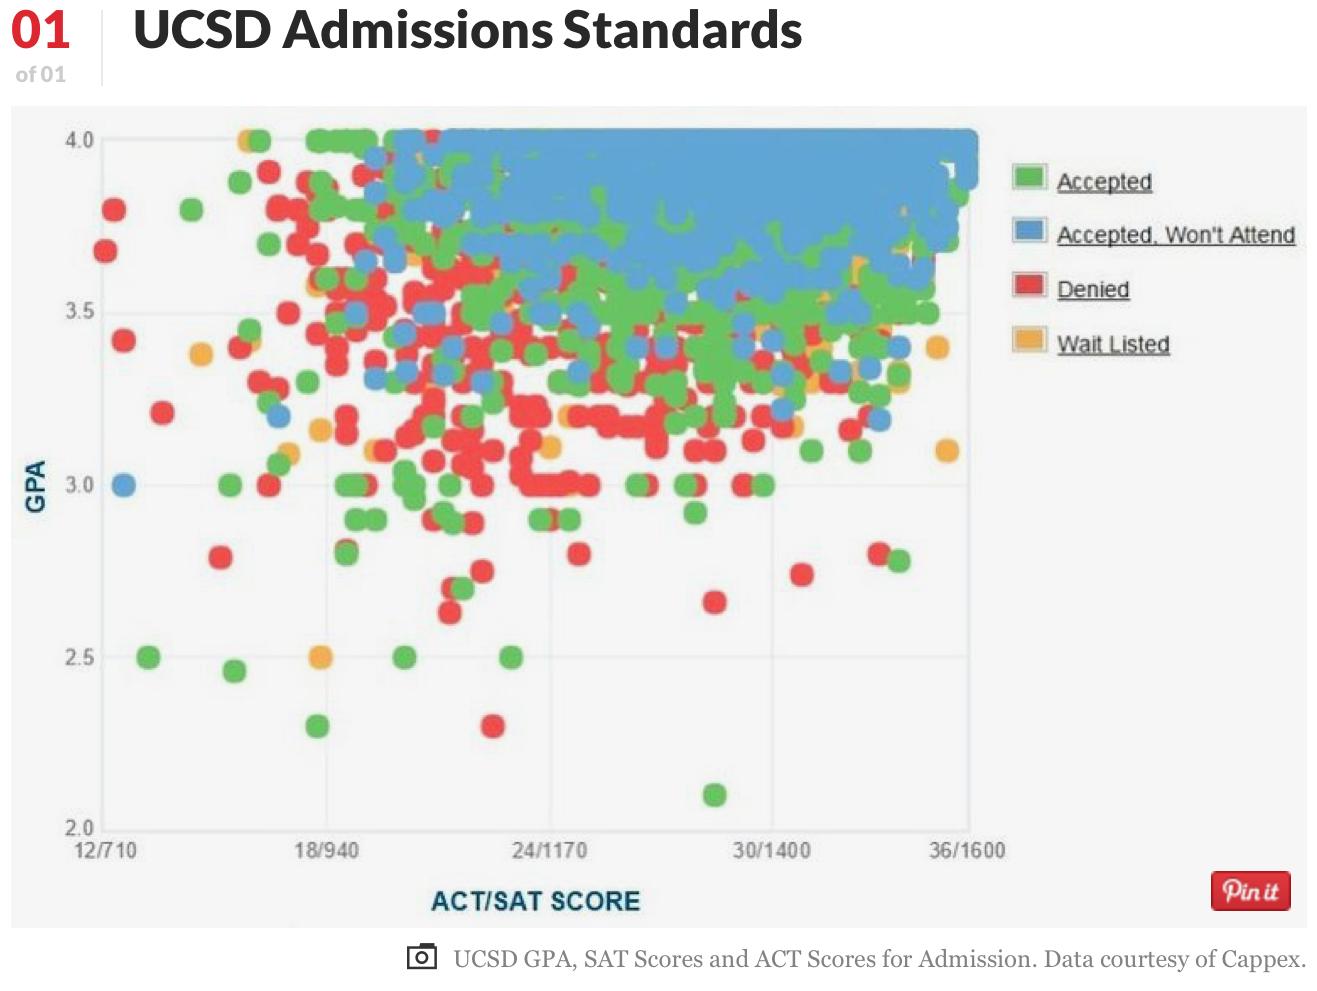 UCSD 聖地牙哥加大 - 西岸最大校園和英式學院系統